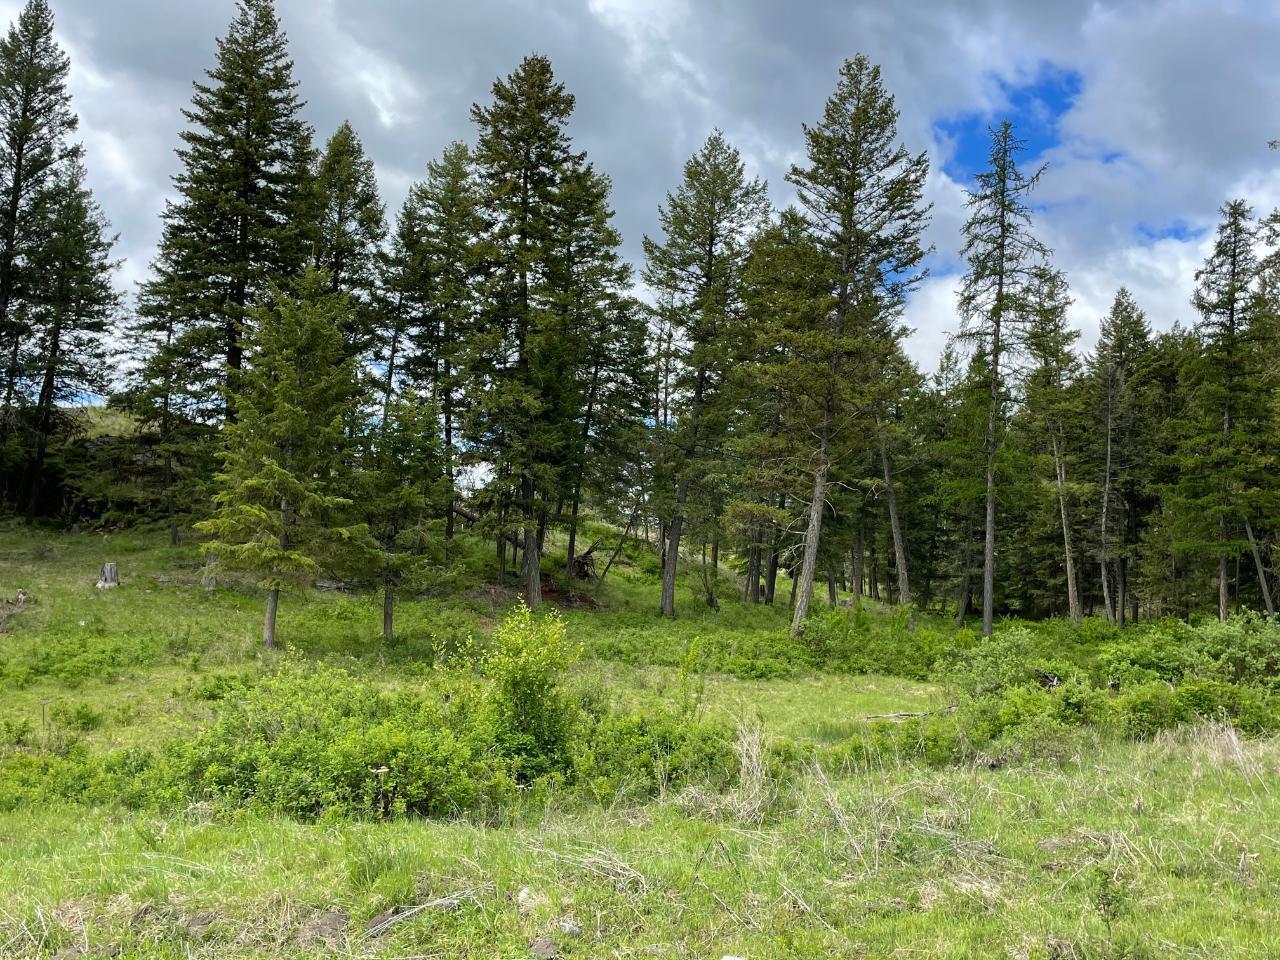 4685 Hwy 3,, Rock Creek/bridesville, British Columbia  V0H 1Y0 - Photo 55 - 189734